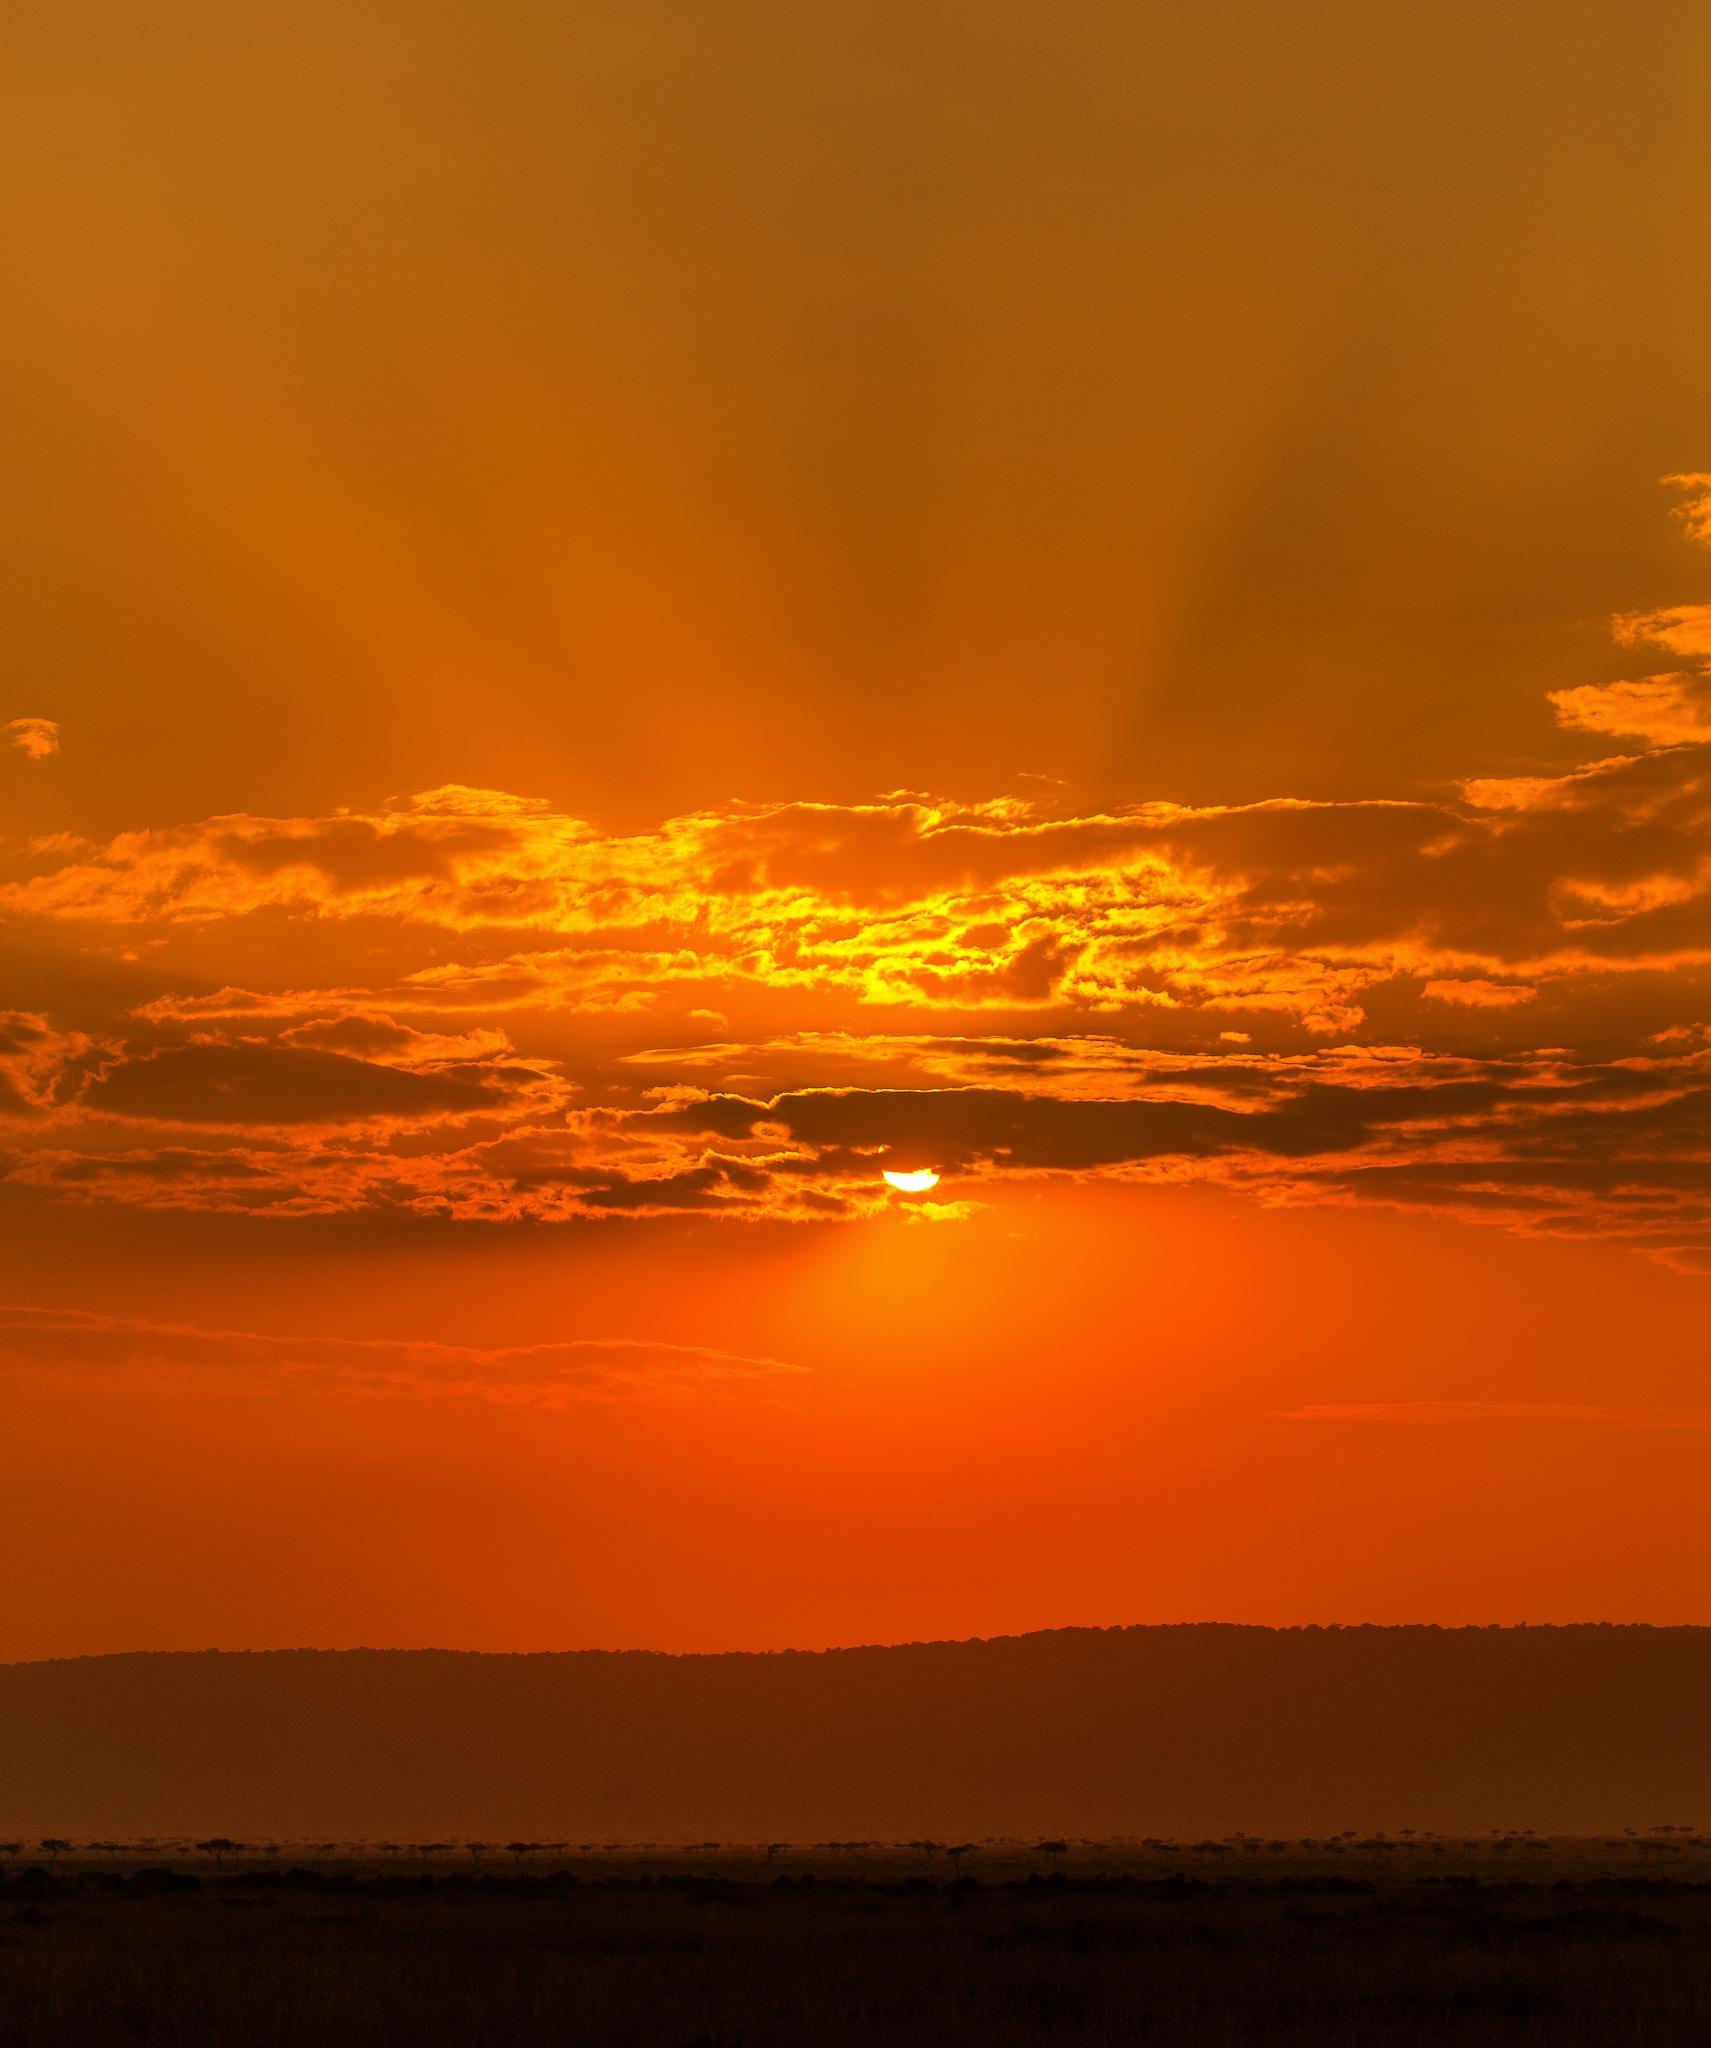 Sunset at Mara by DrSudhir Hasamnis